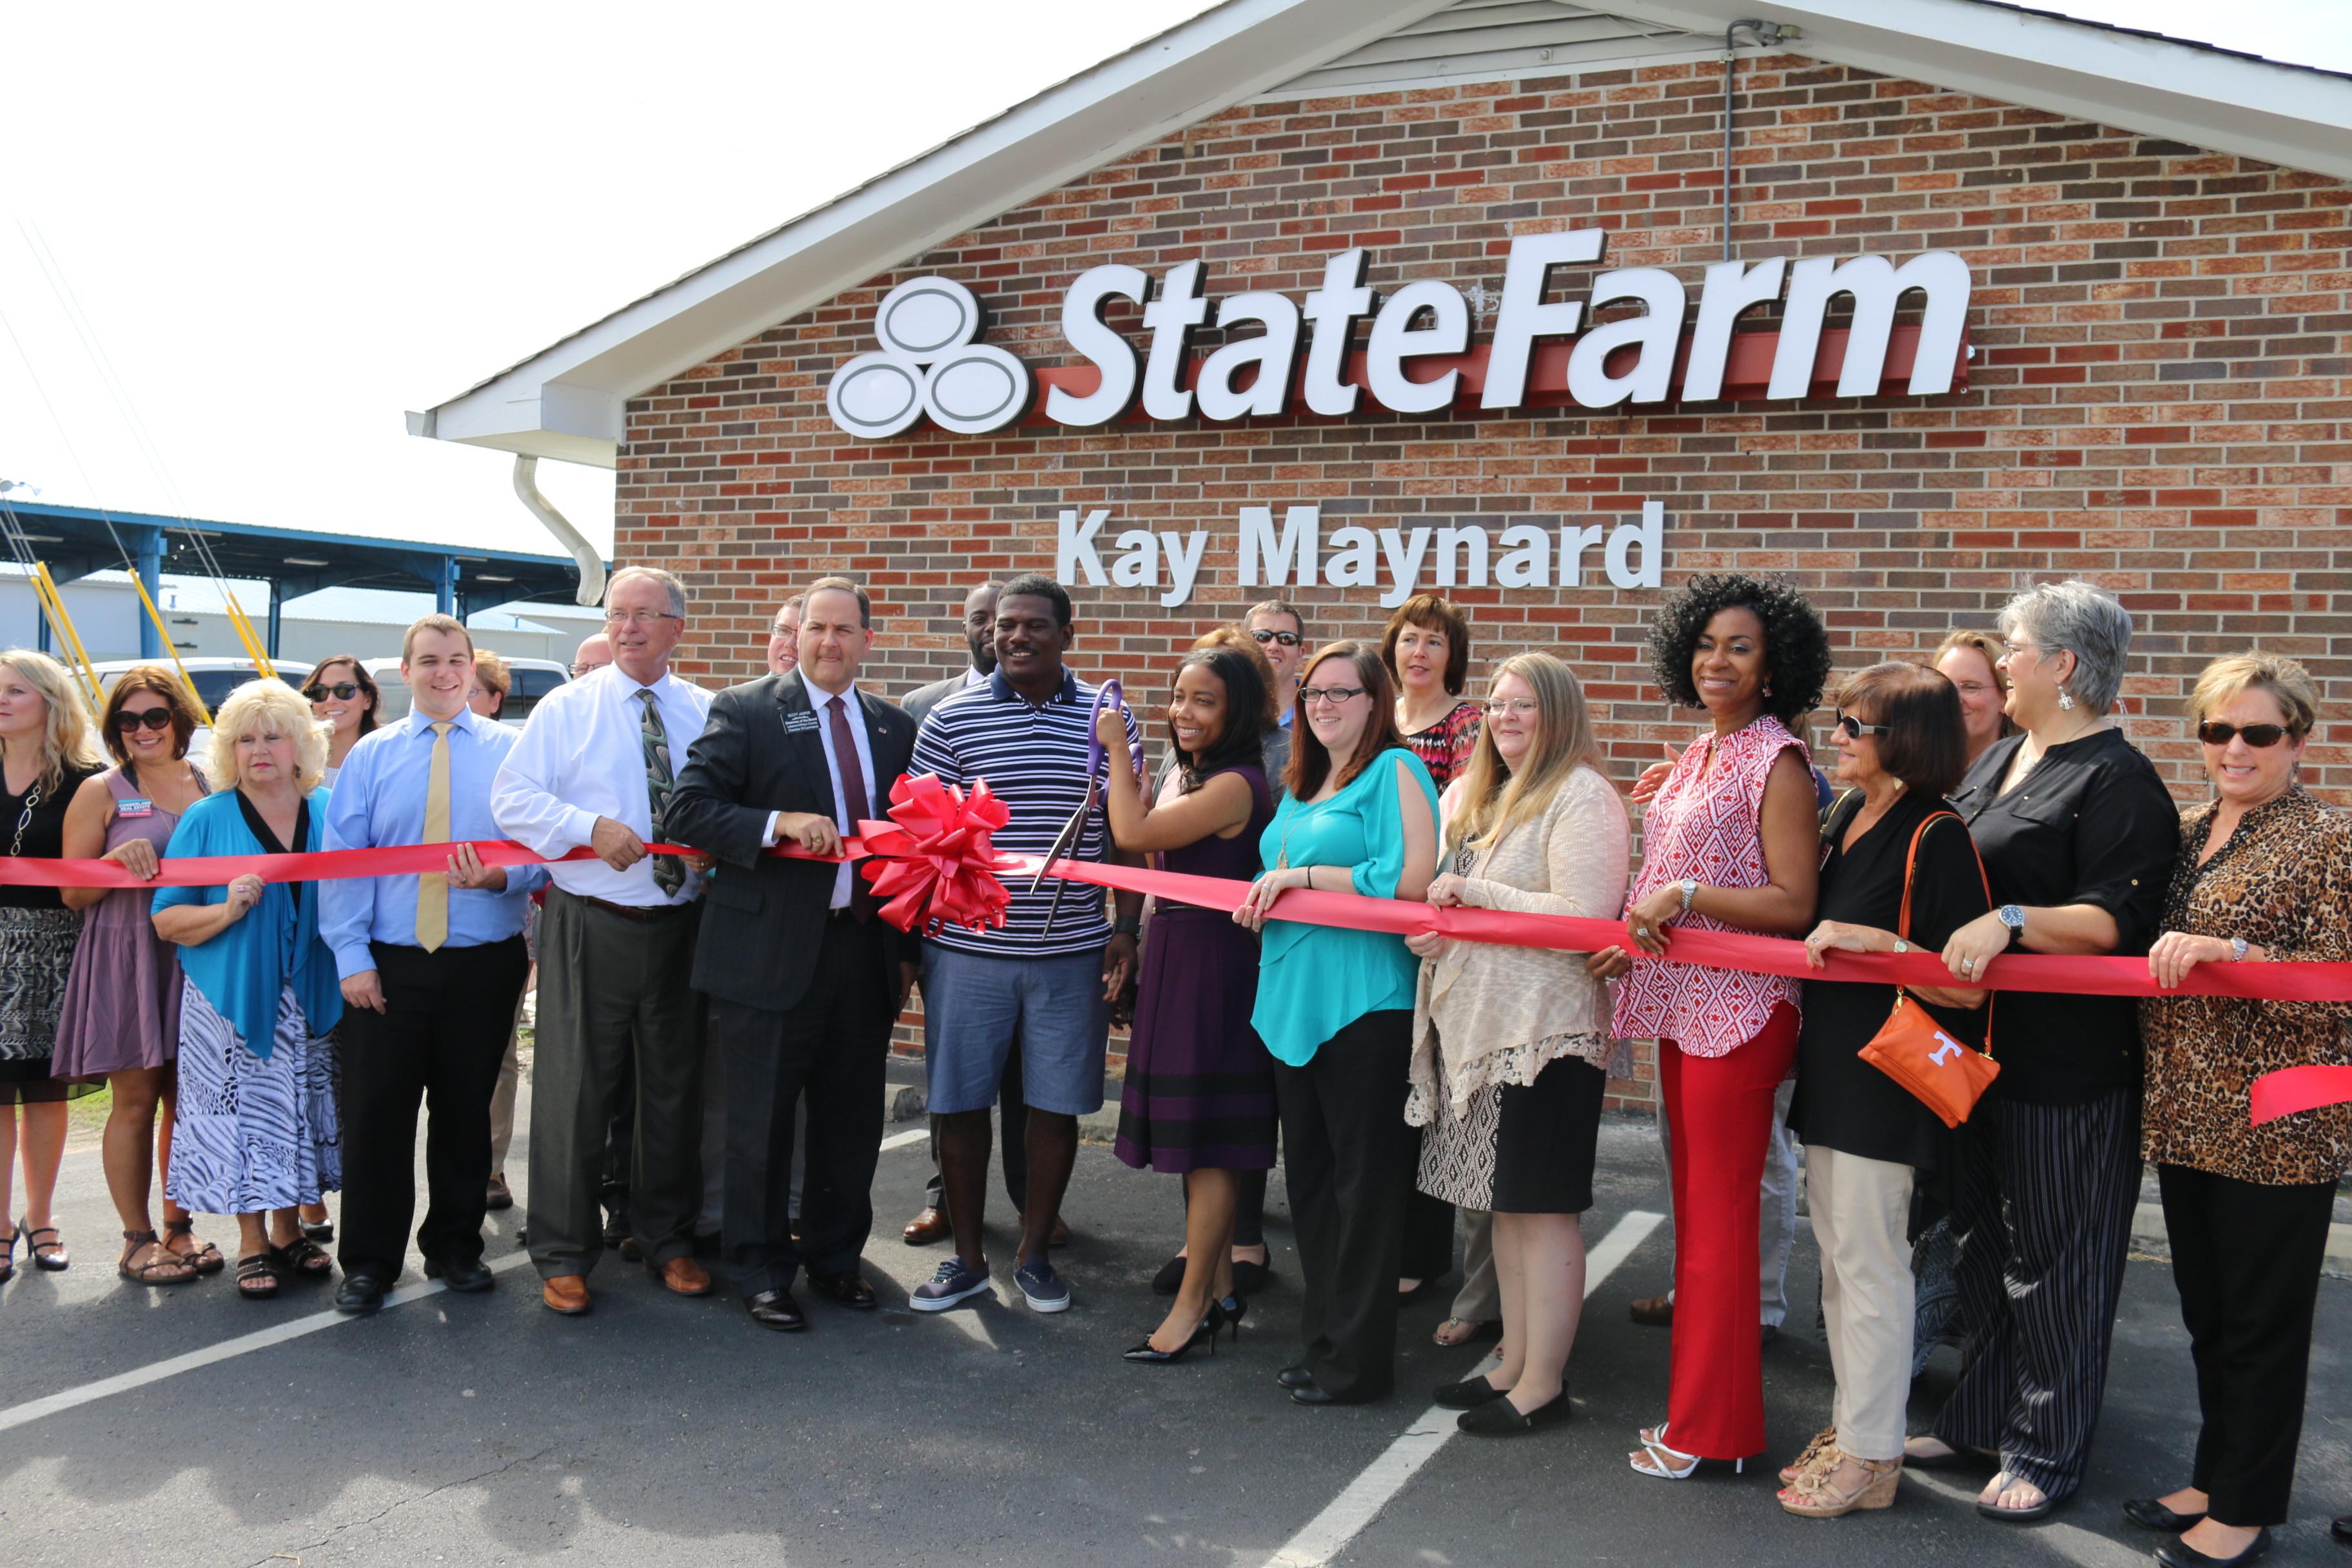 Kay Maynard State Farm Ribbon Cutting Ceremony is a HIT!